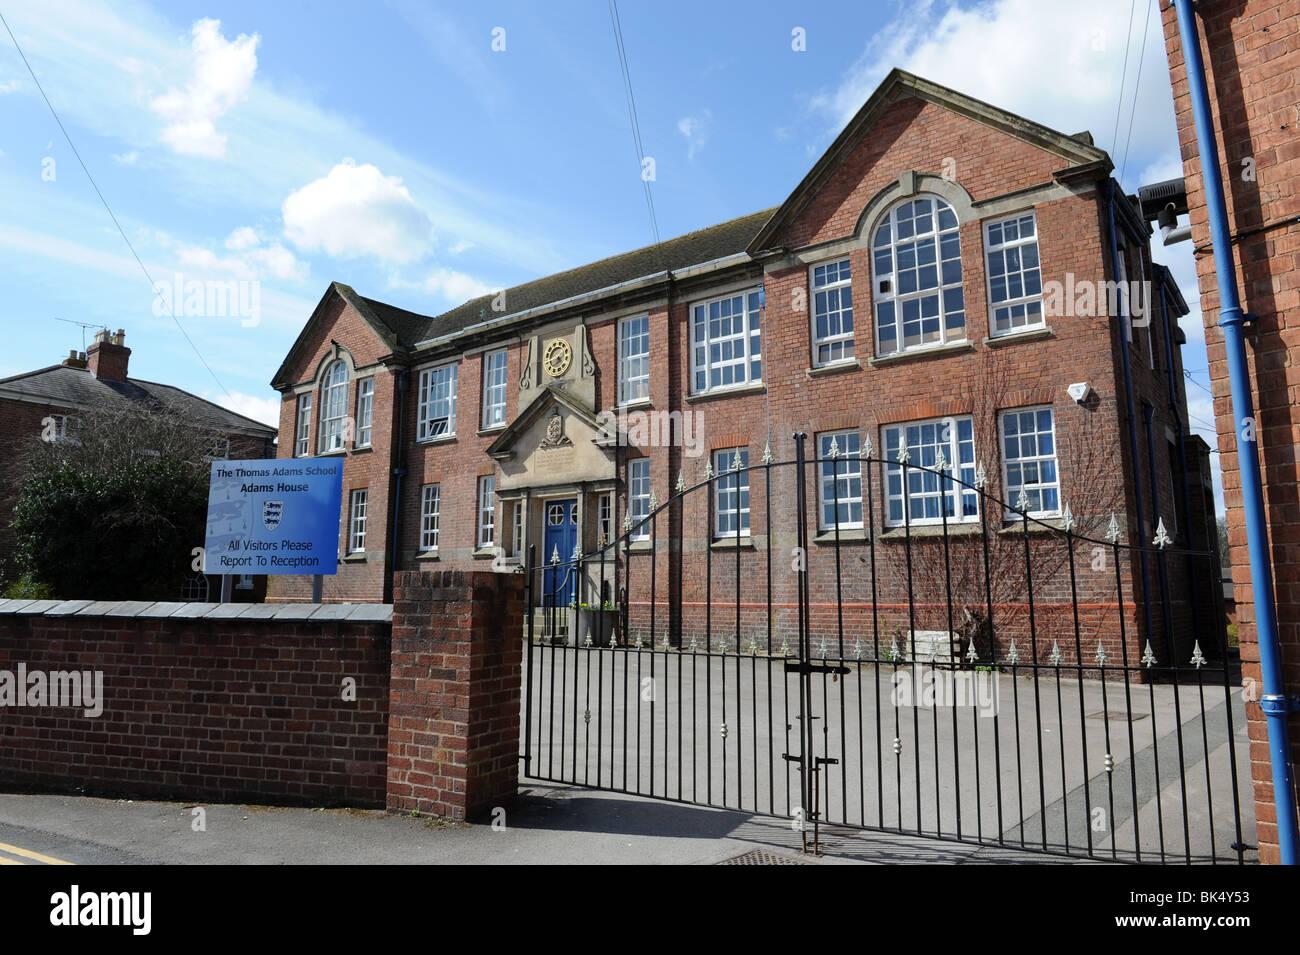 The Thomas Adams School at Wem in north Shropshire uk - Stock Image